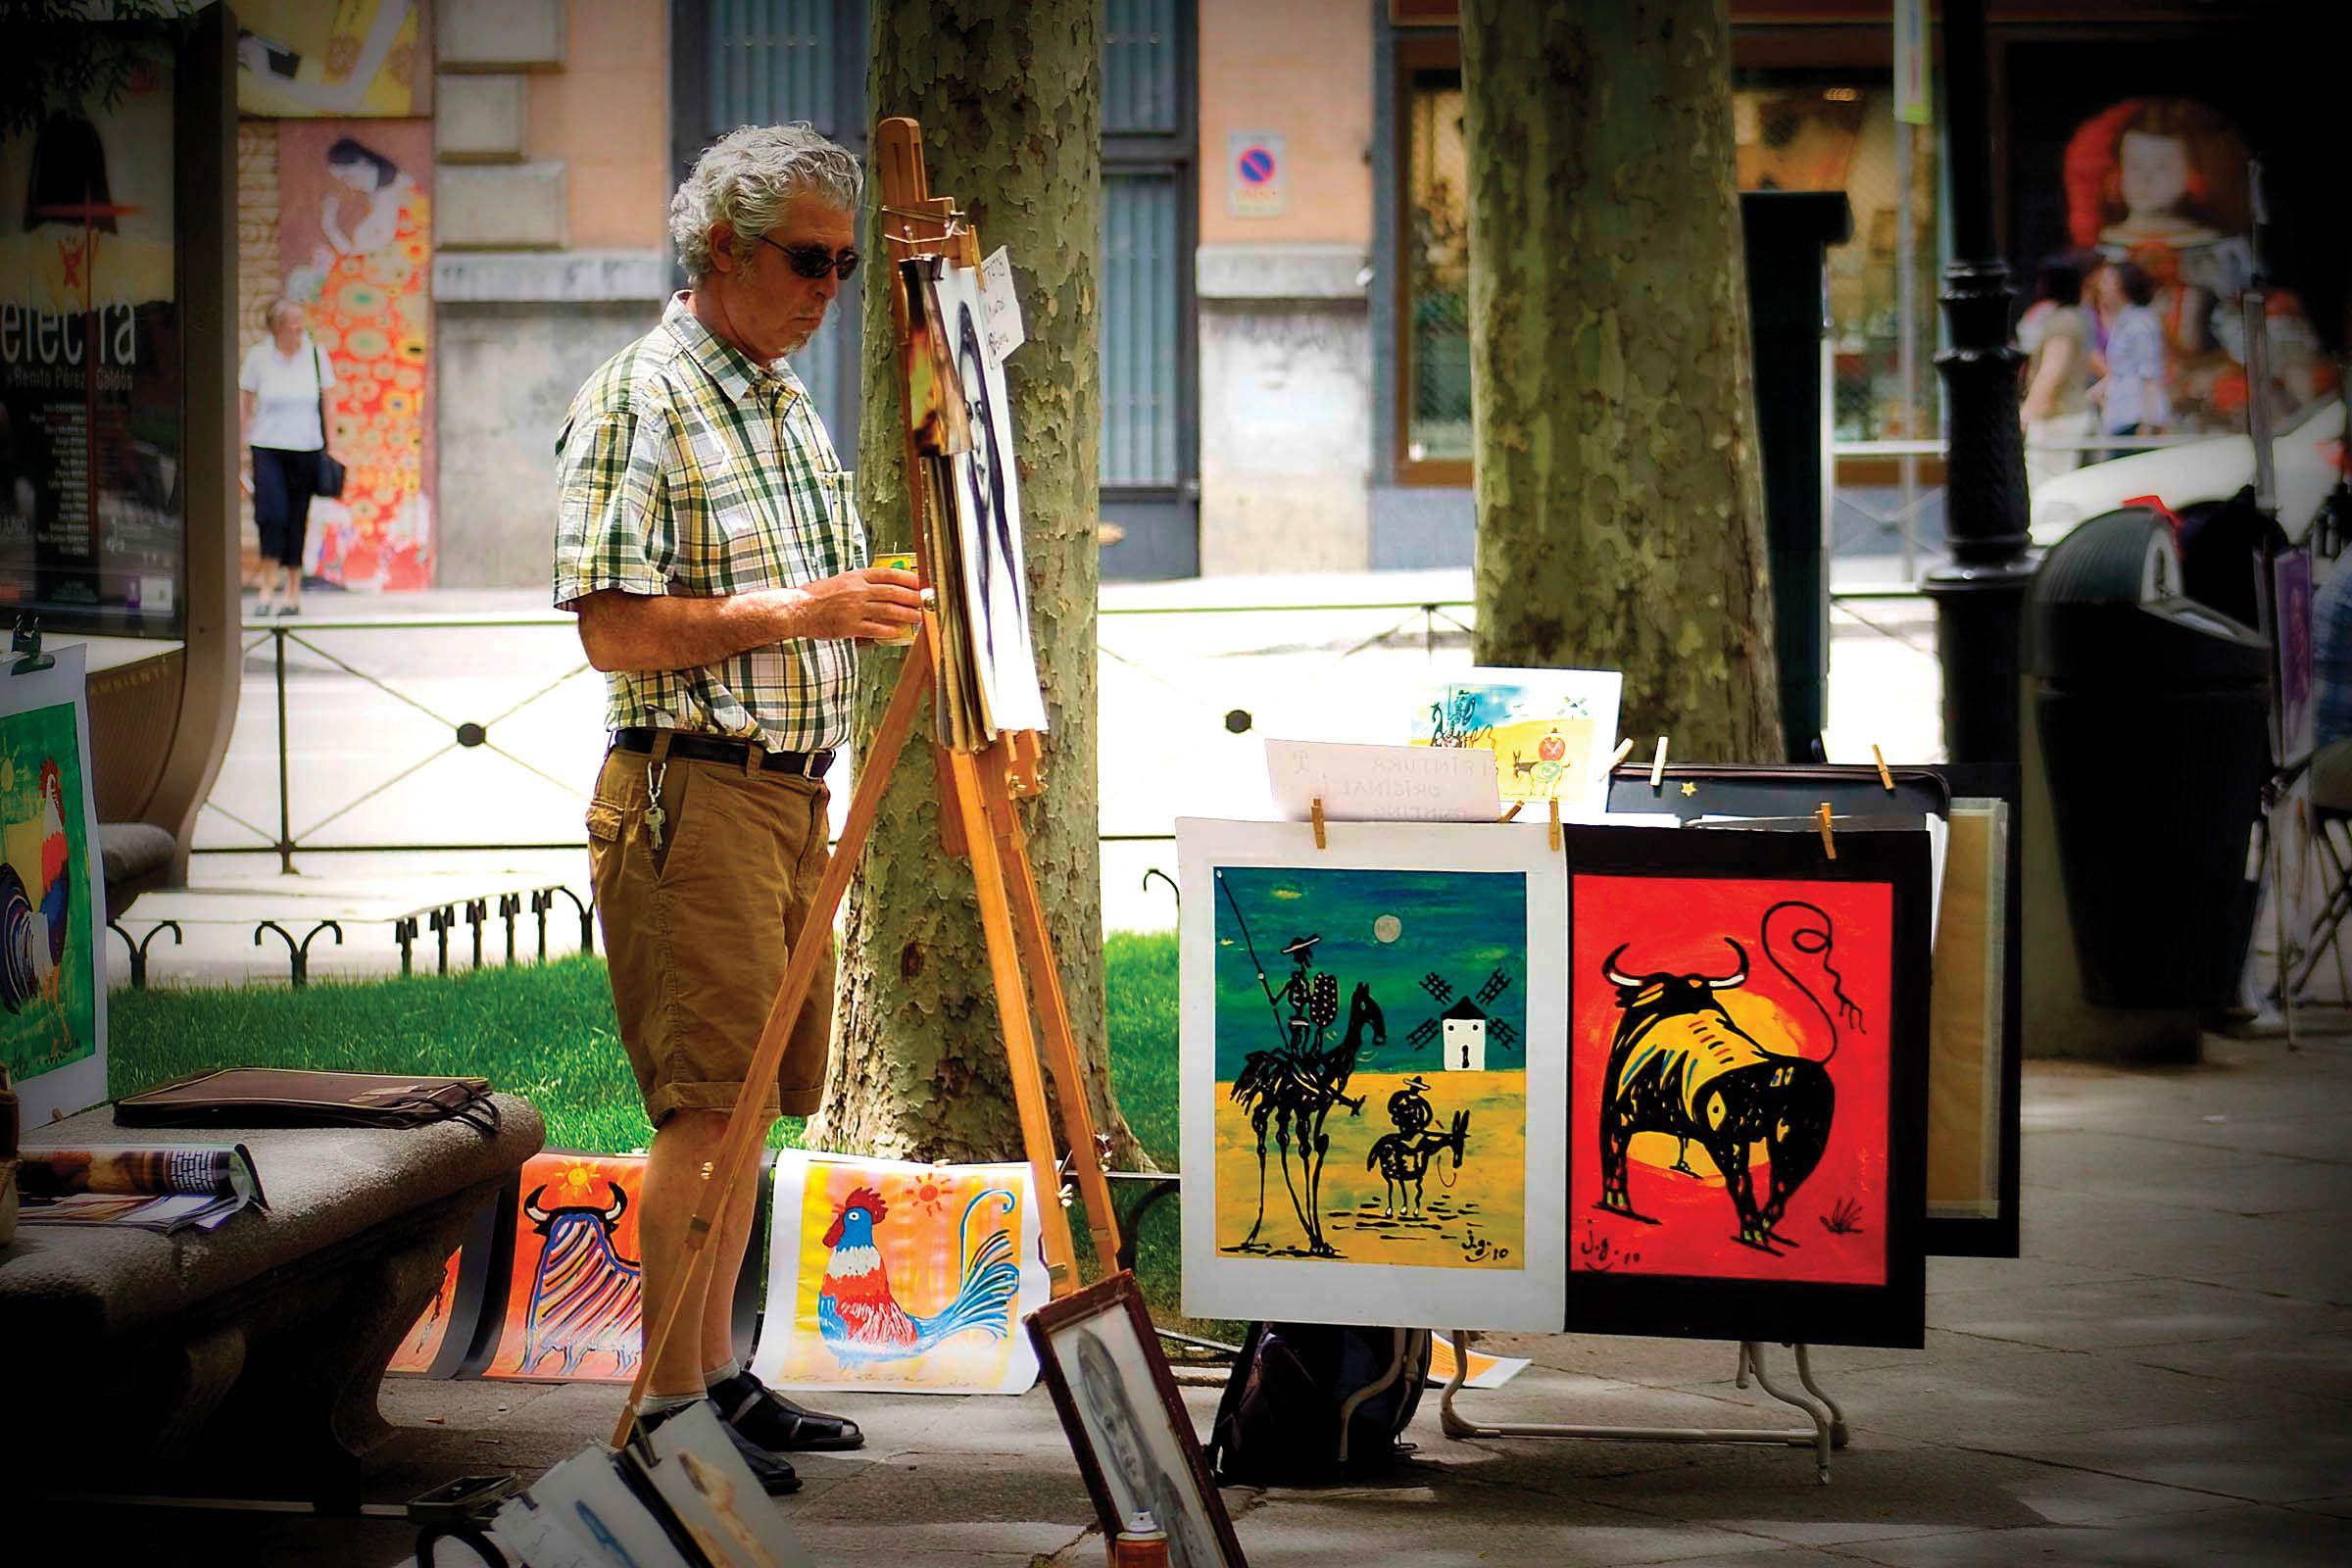 Street artist in Madrid, Spain. Photo by Louise Farmer